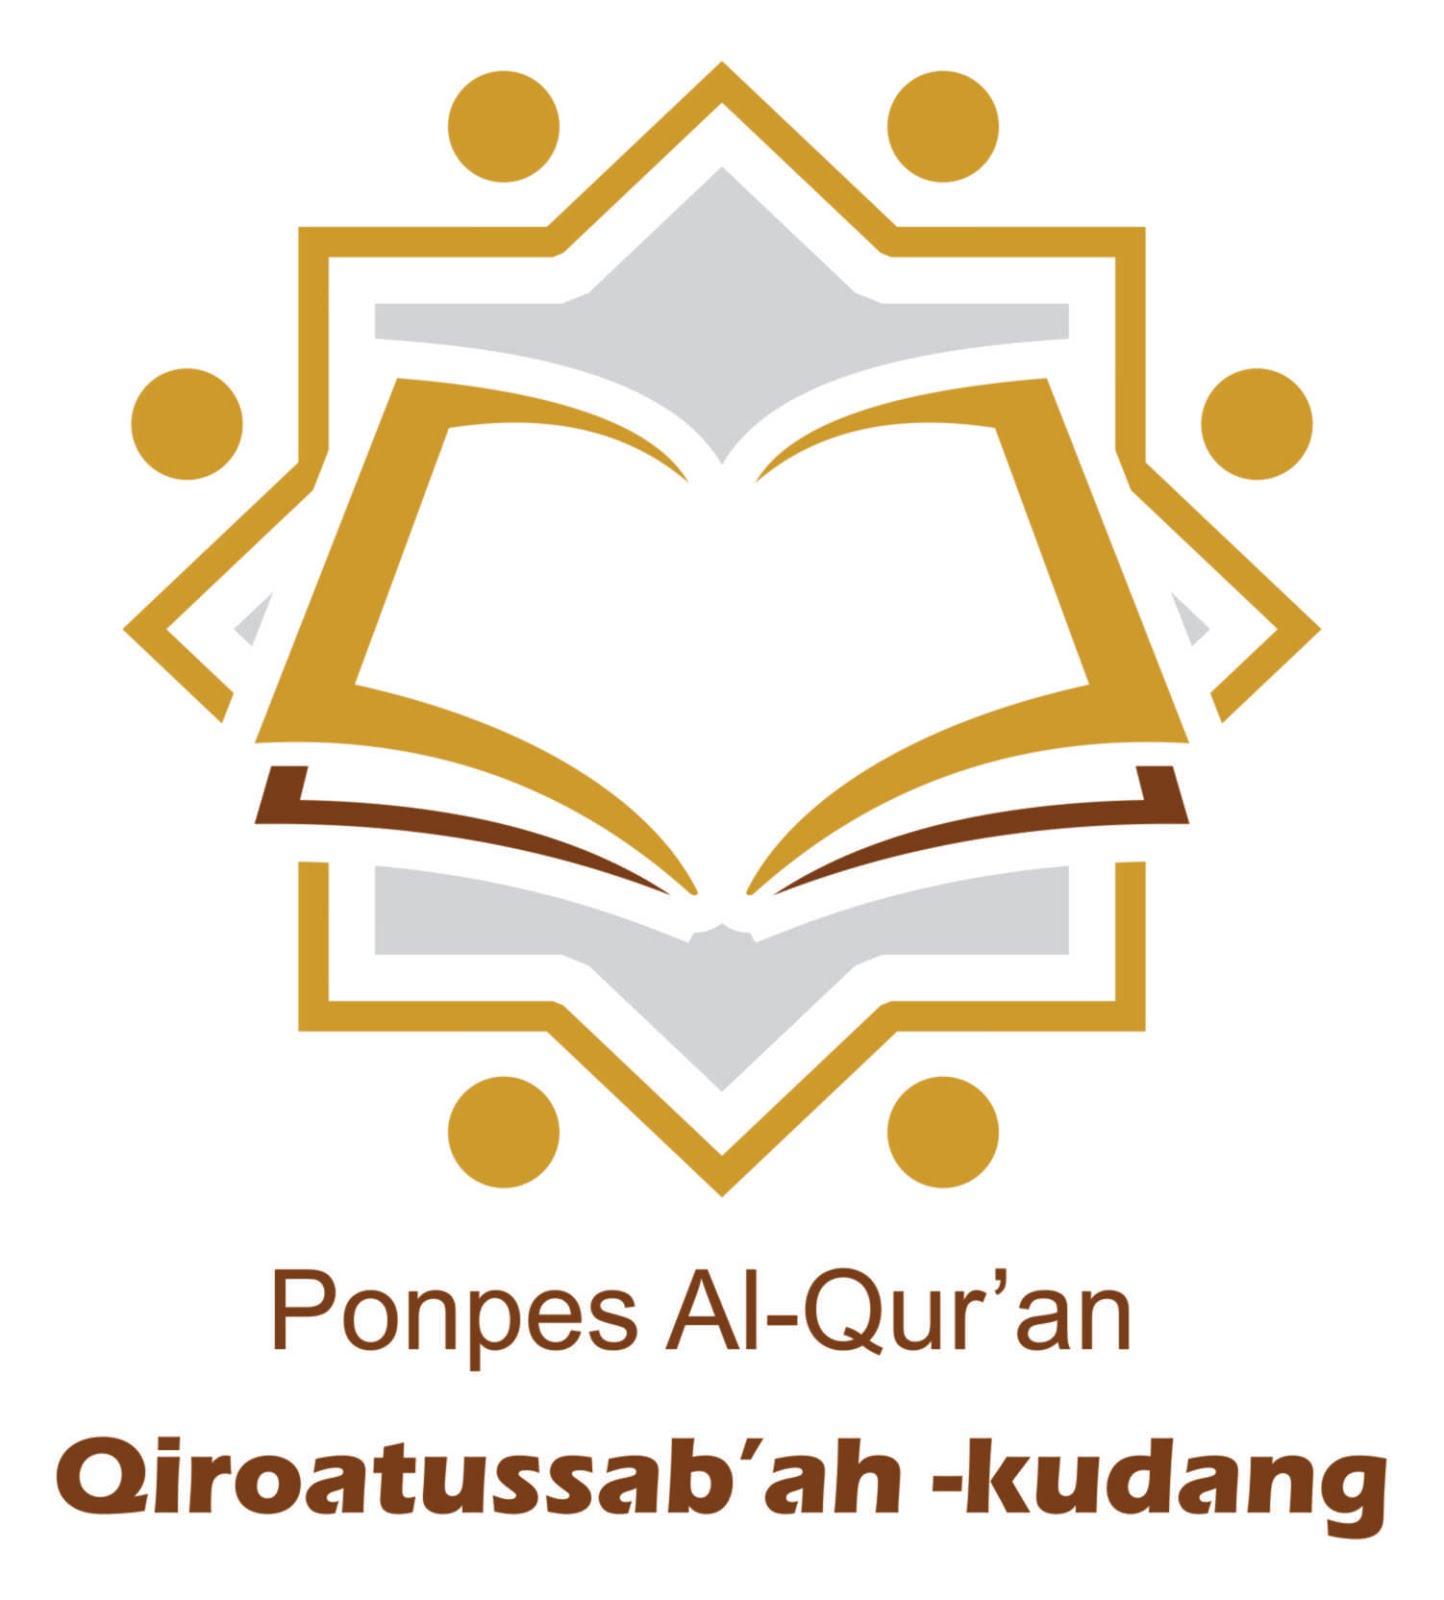 Ponpes Al-Qur'an Qiroatussab'ah - Kudang